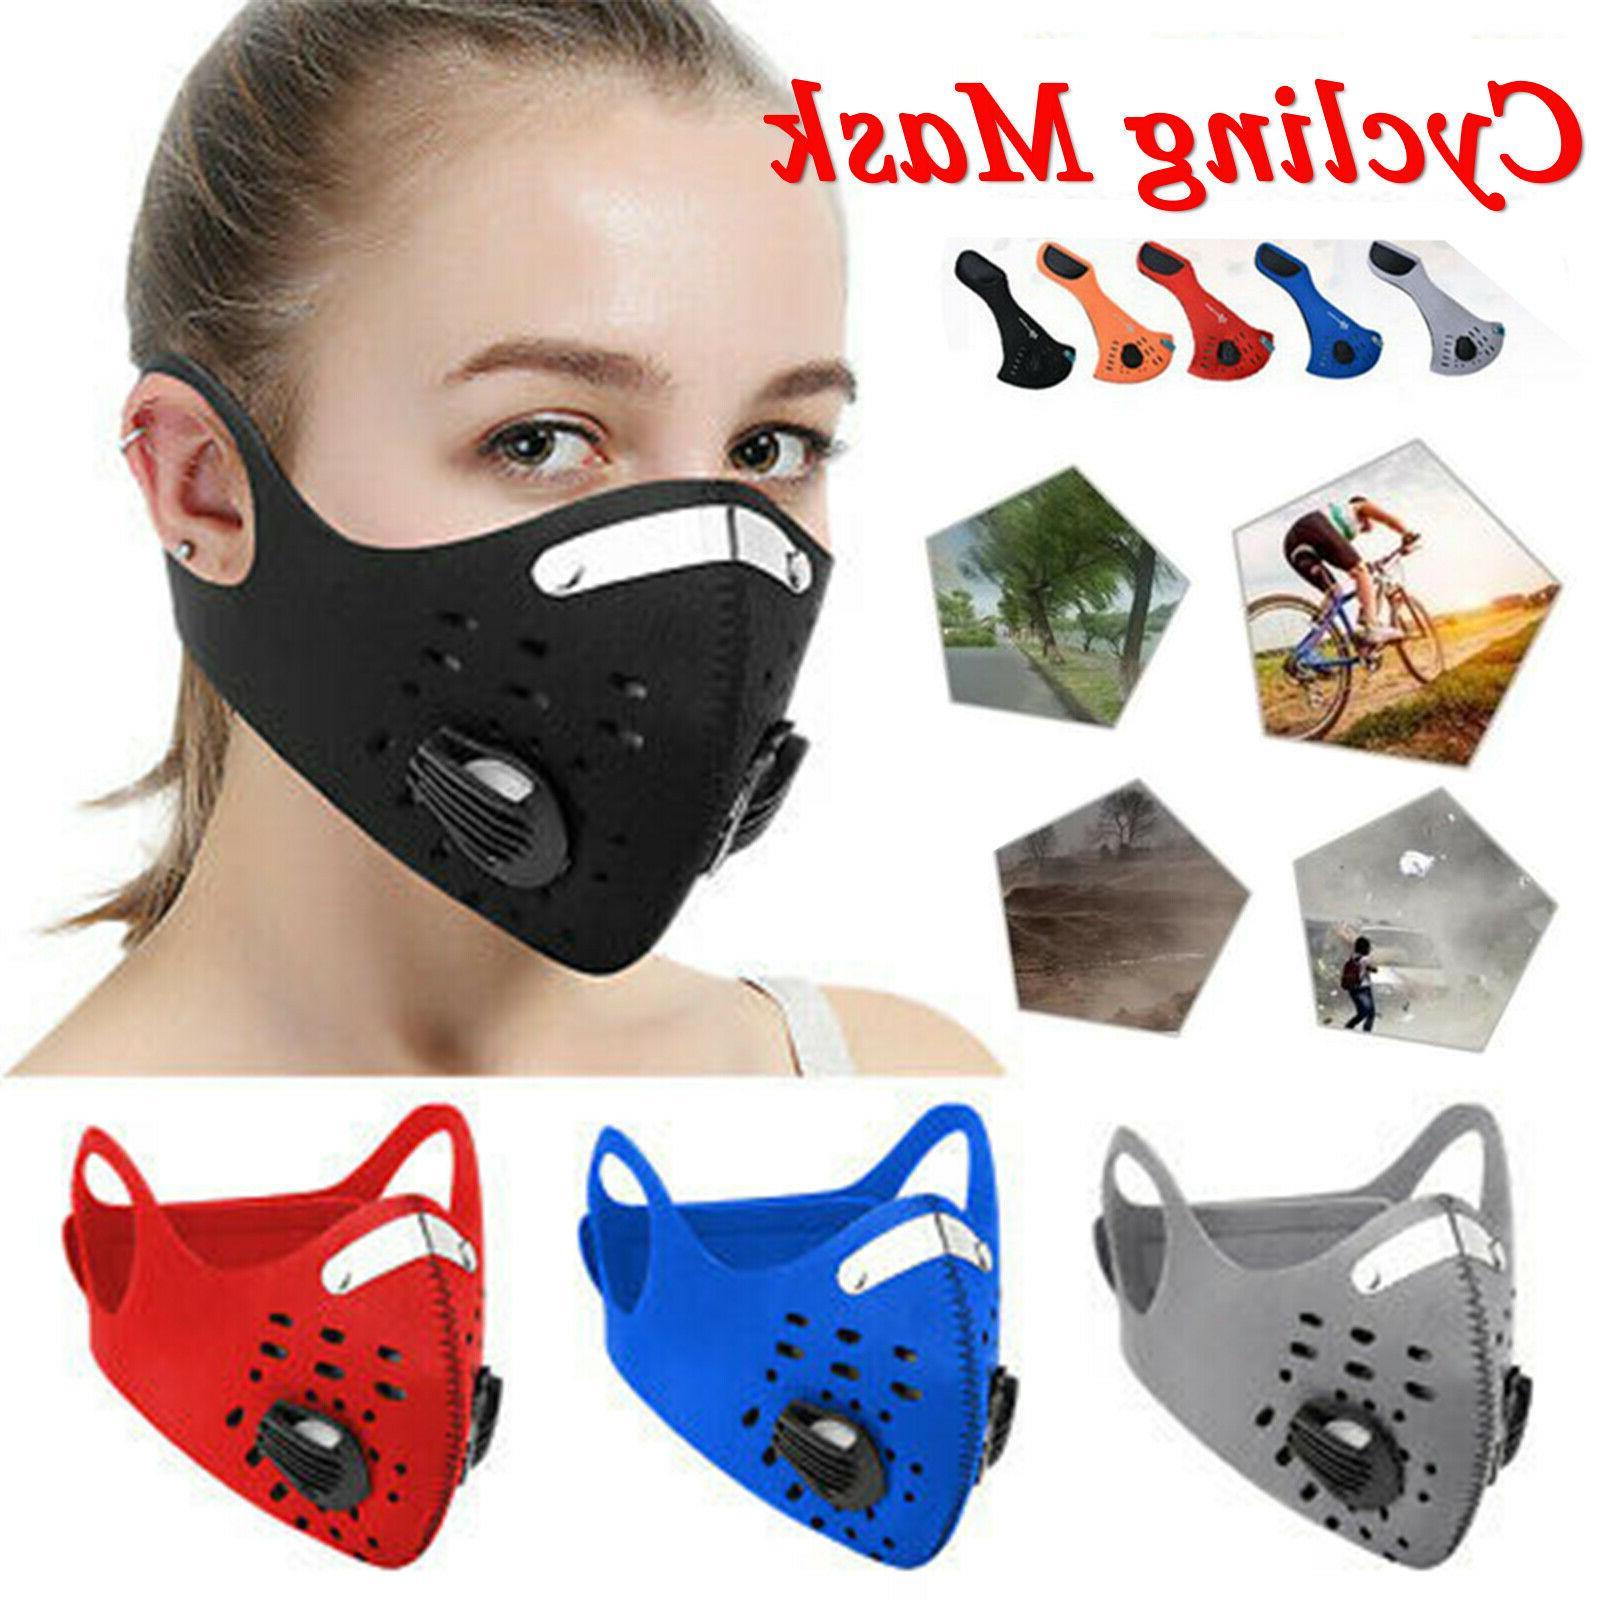 Face Mask Reusable Cover Dual +1 Carbon